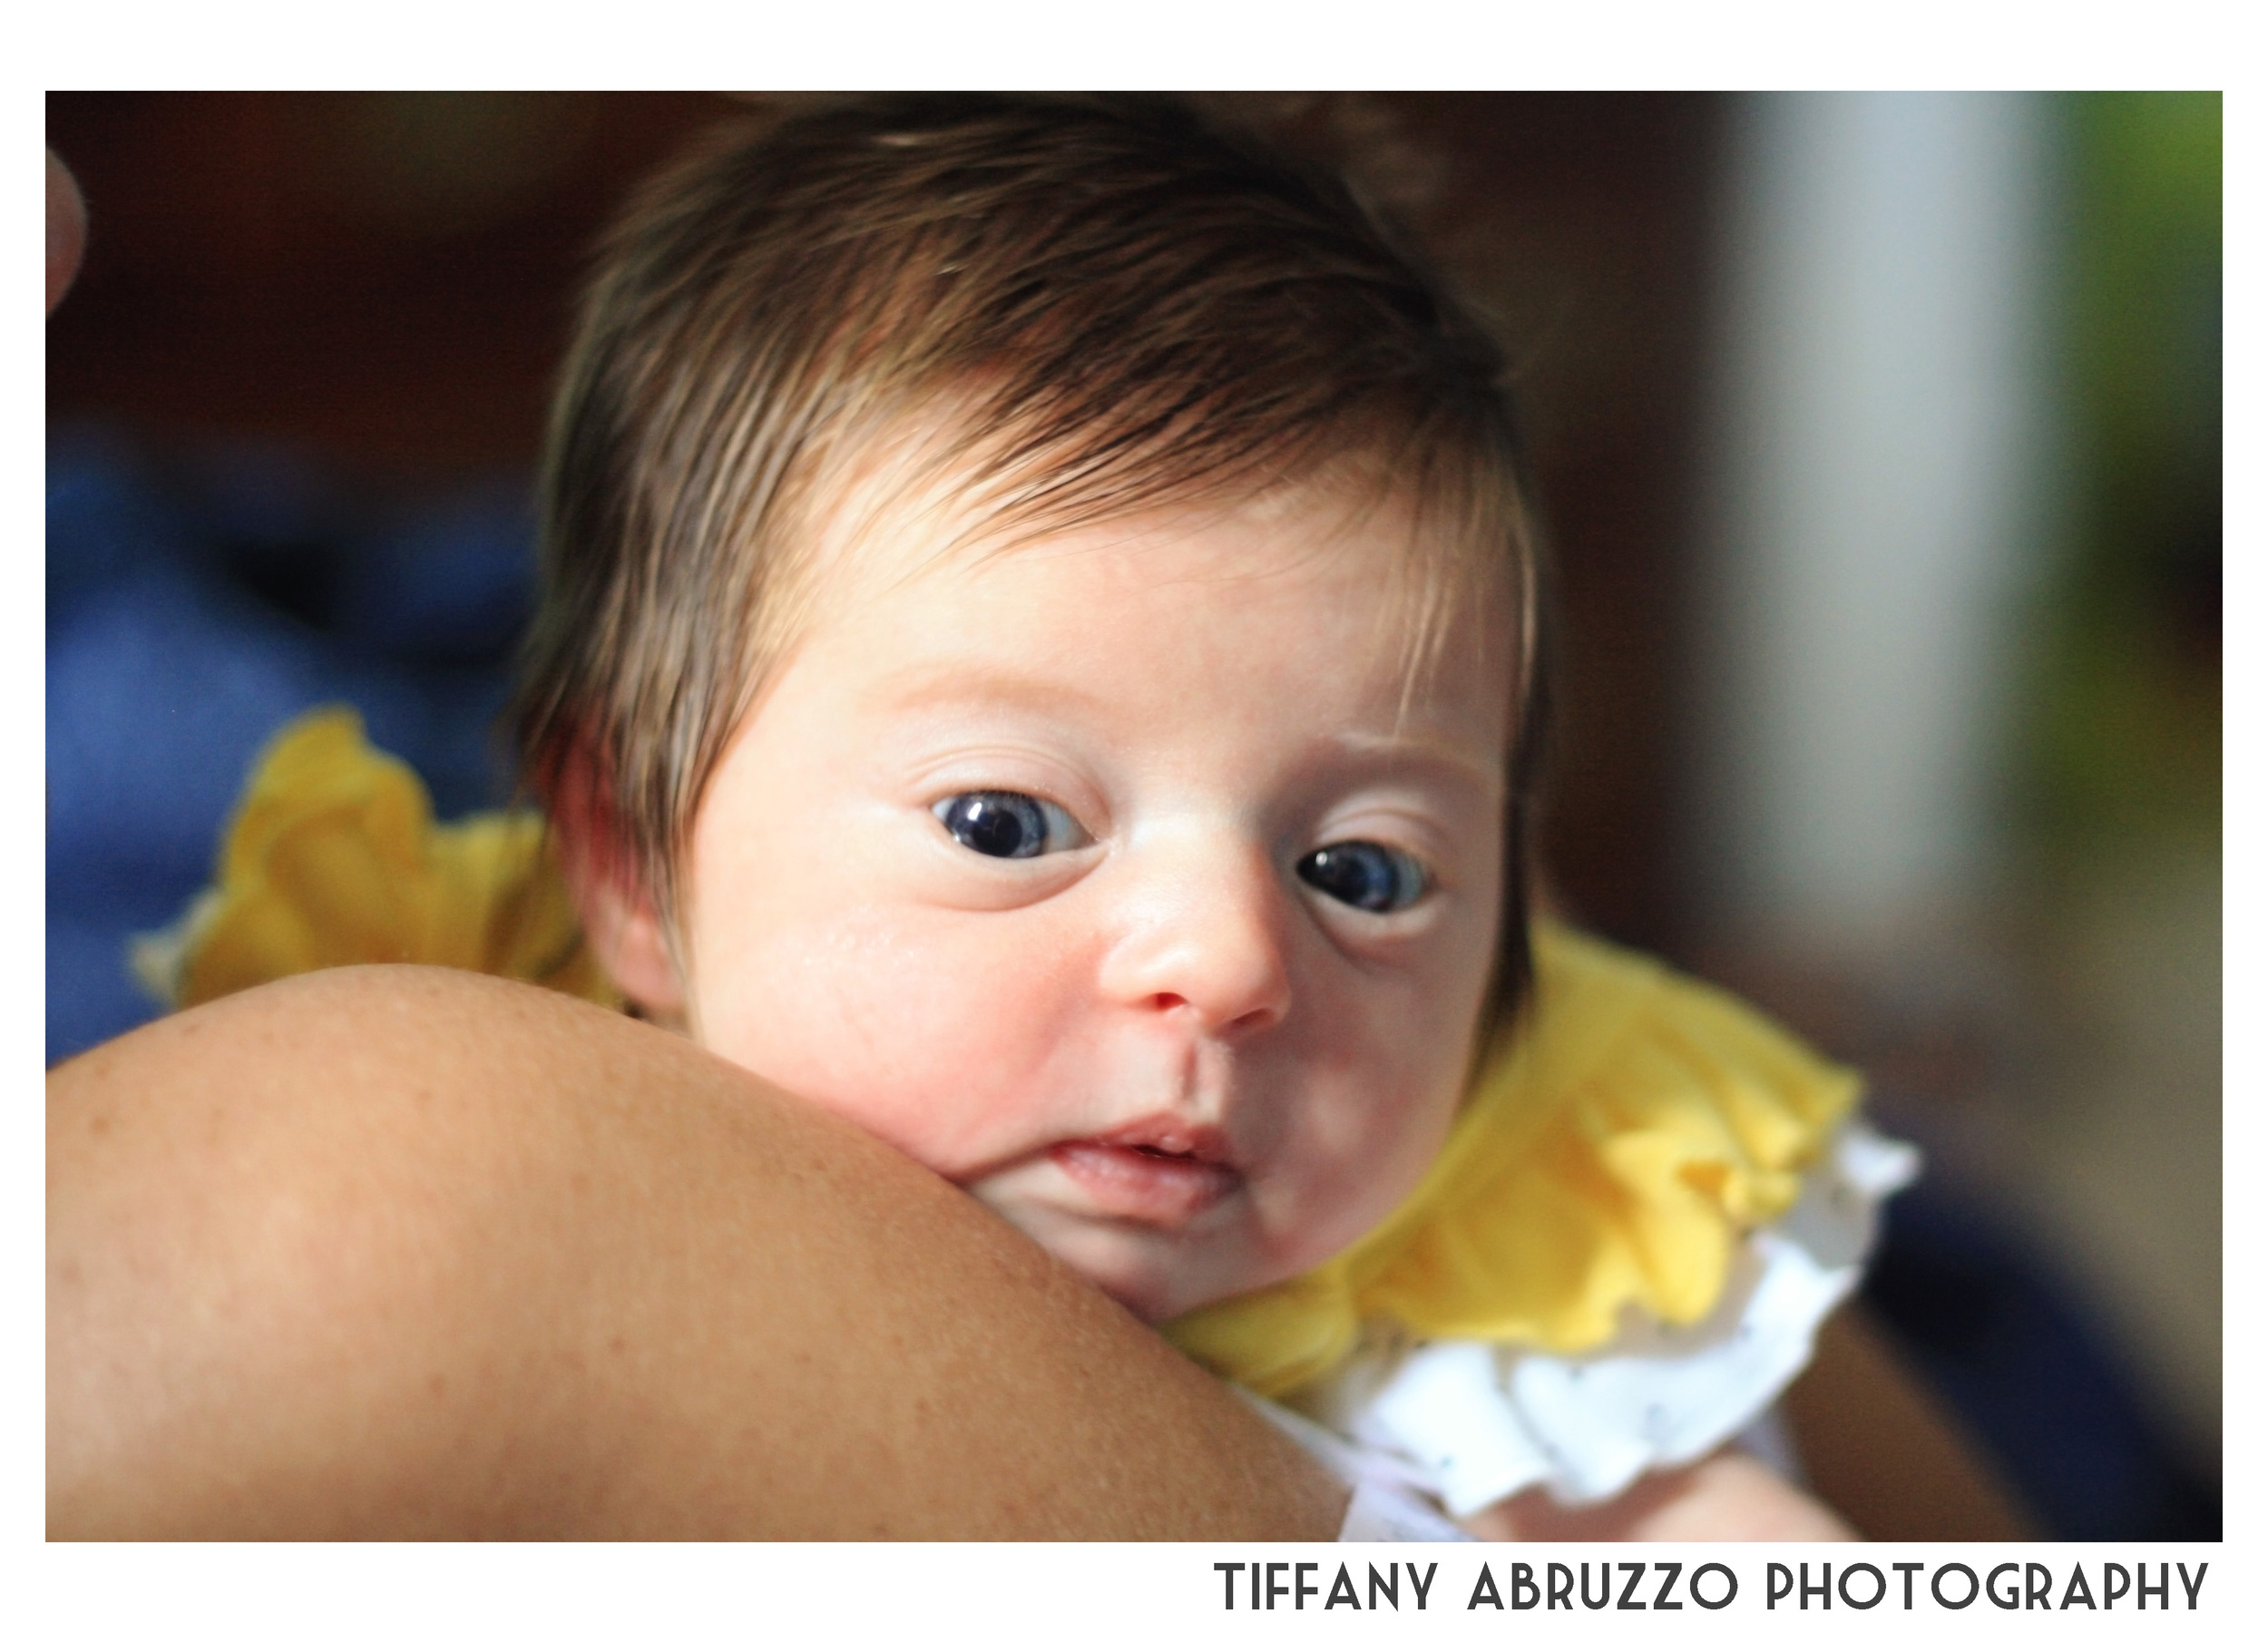 TIFFANY ABRUZZO PHOTOGRAPHY WILMINGTON NC PHOTOGRAPHER